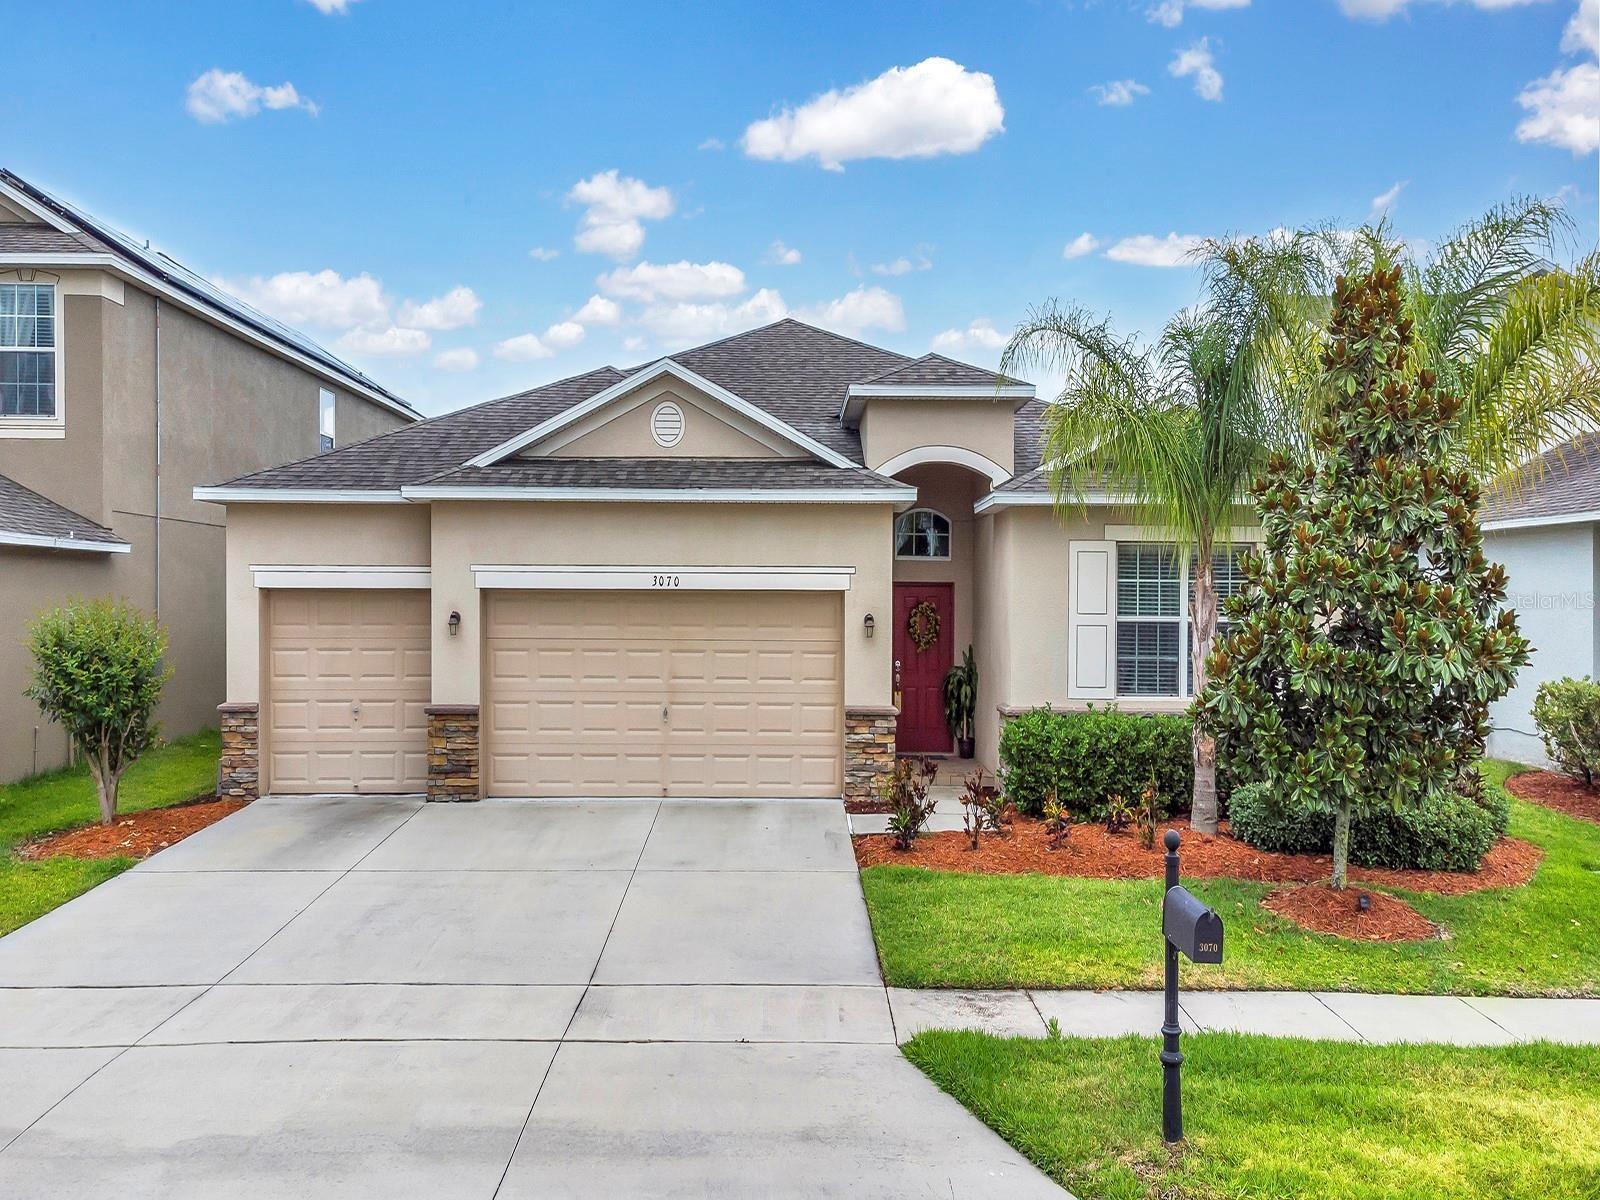 3070 YOUNGFORD STREET, Orlando, FL 32824 - #: O5949338